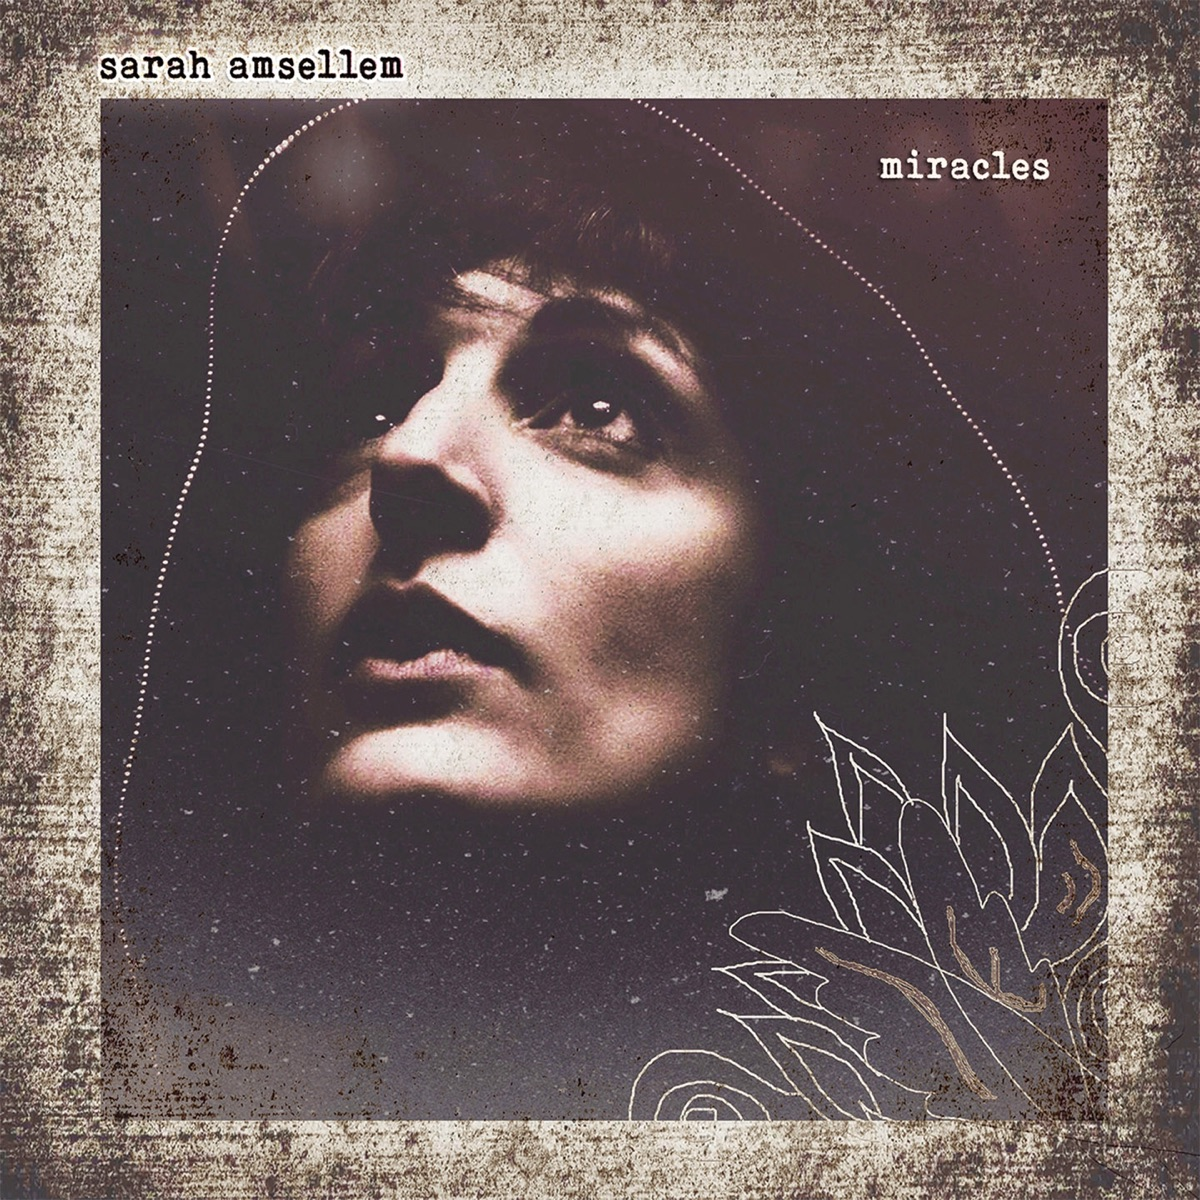 Sarah Amsellem - Miracles